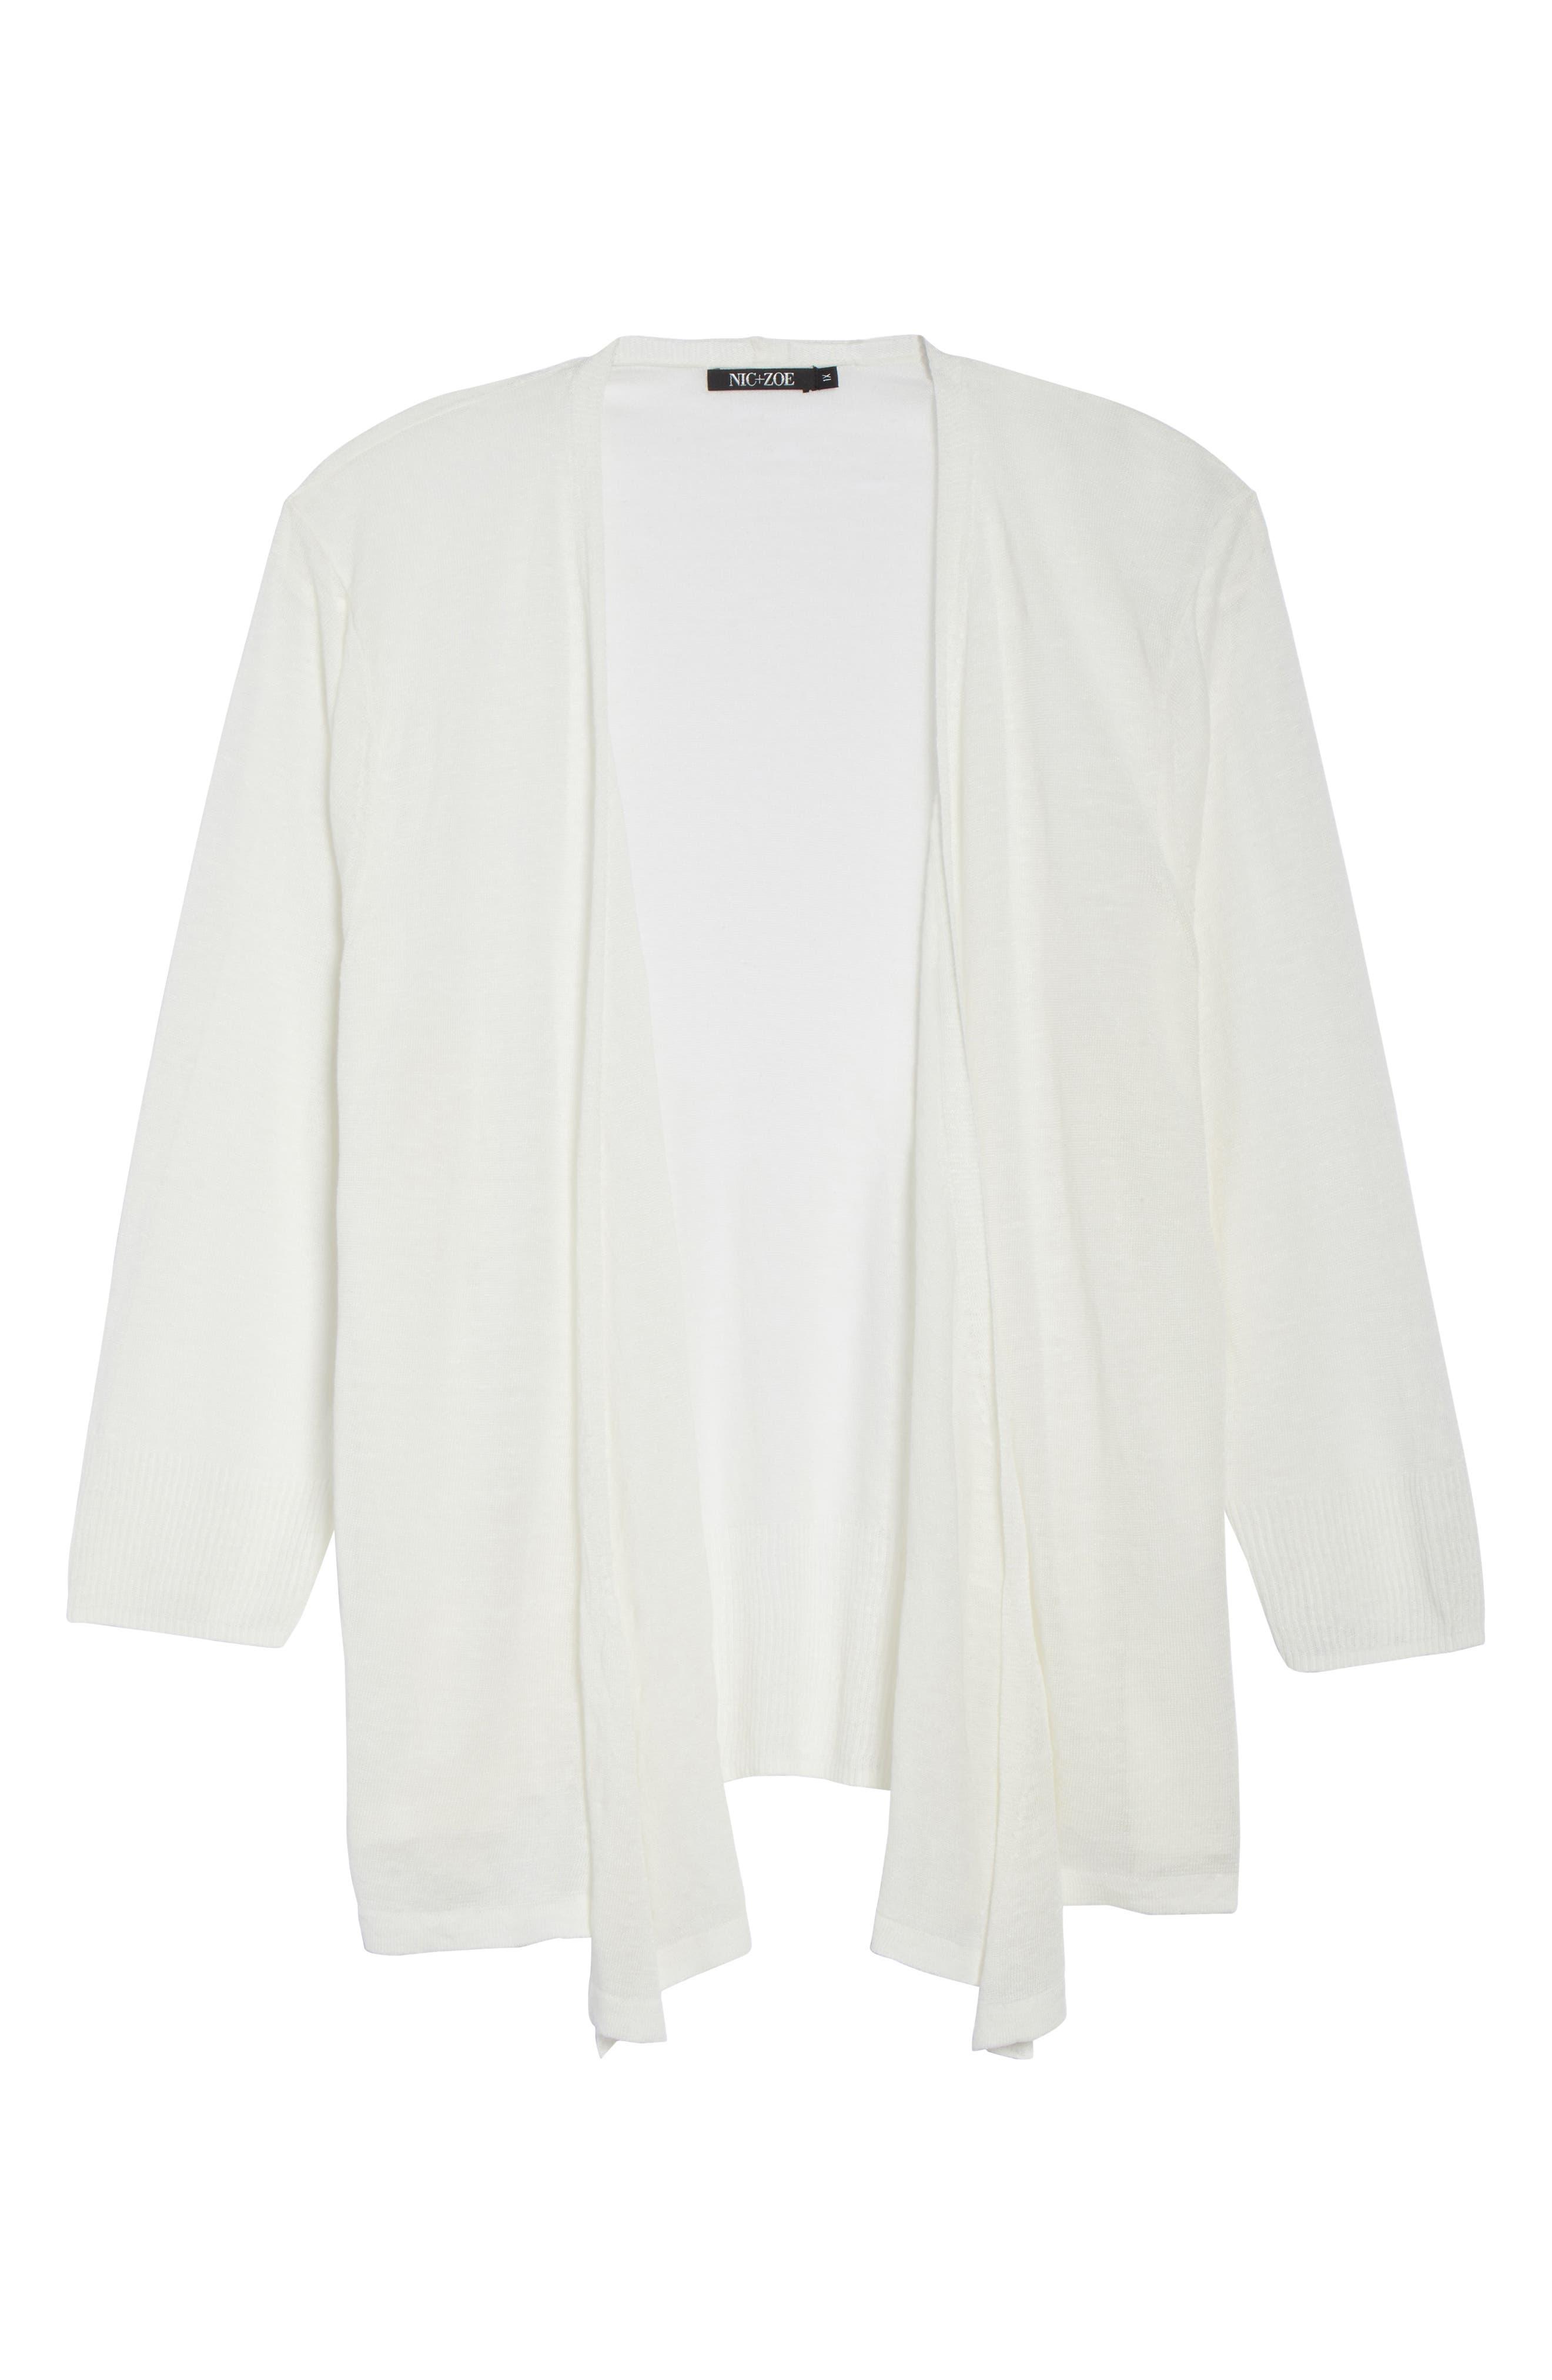 '4-Way' Three Quarter Sleeve Convertible Cardigan,                             Alternate thumbnail 7, color,                             MILK WHITE